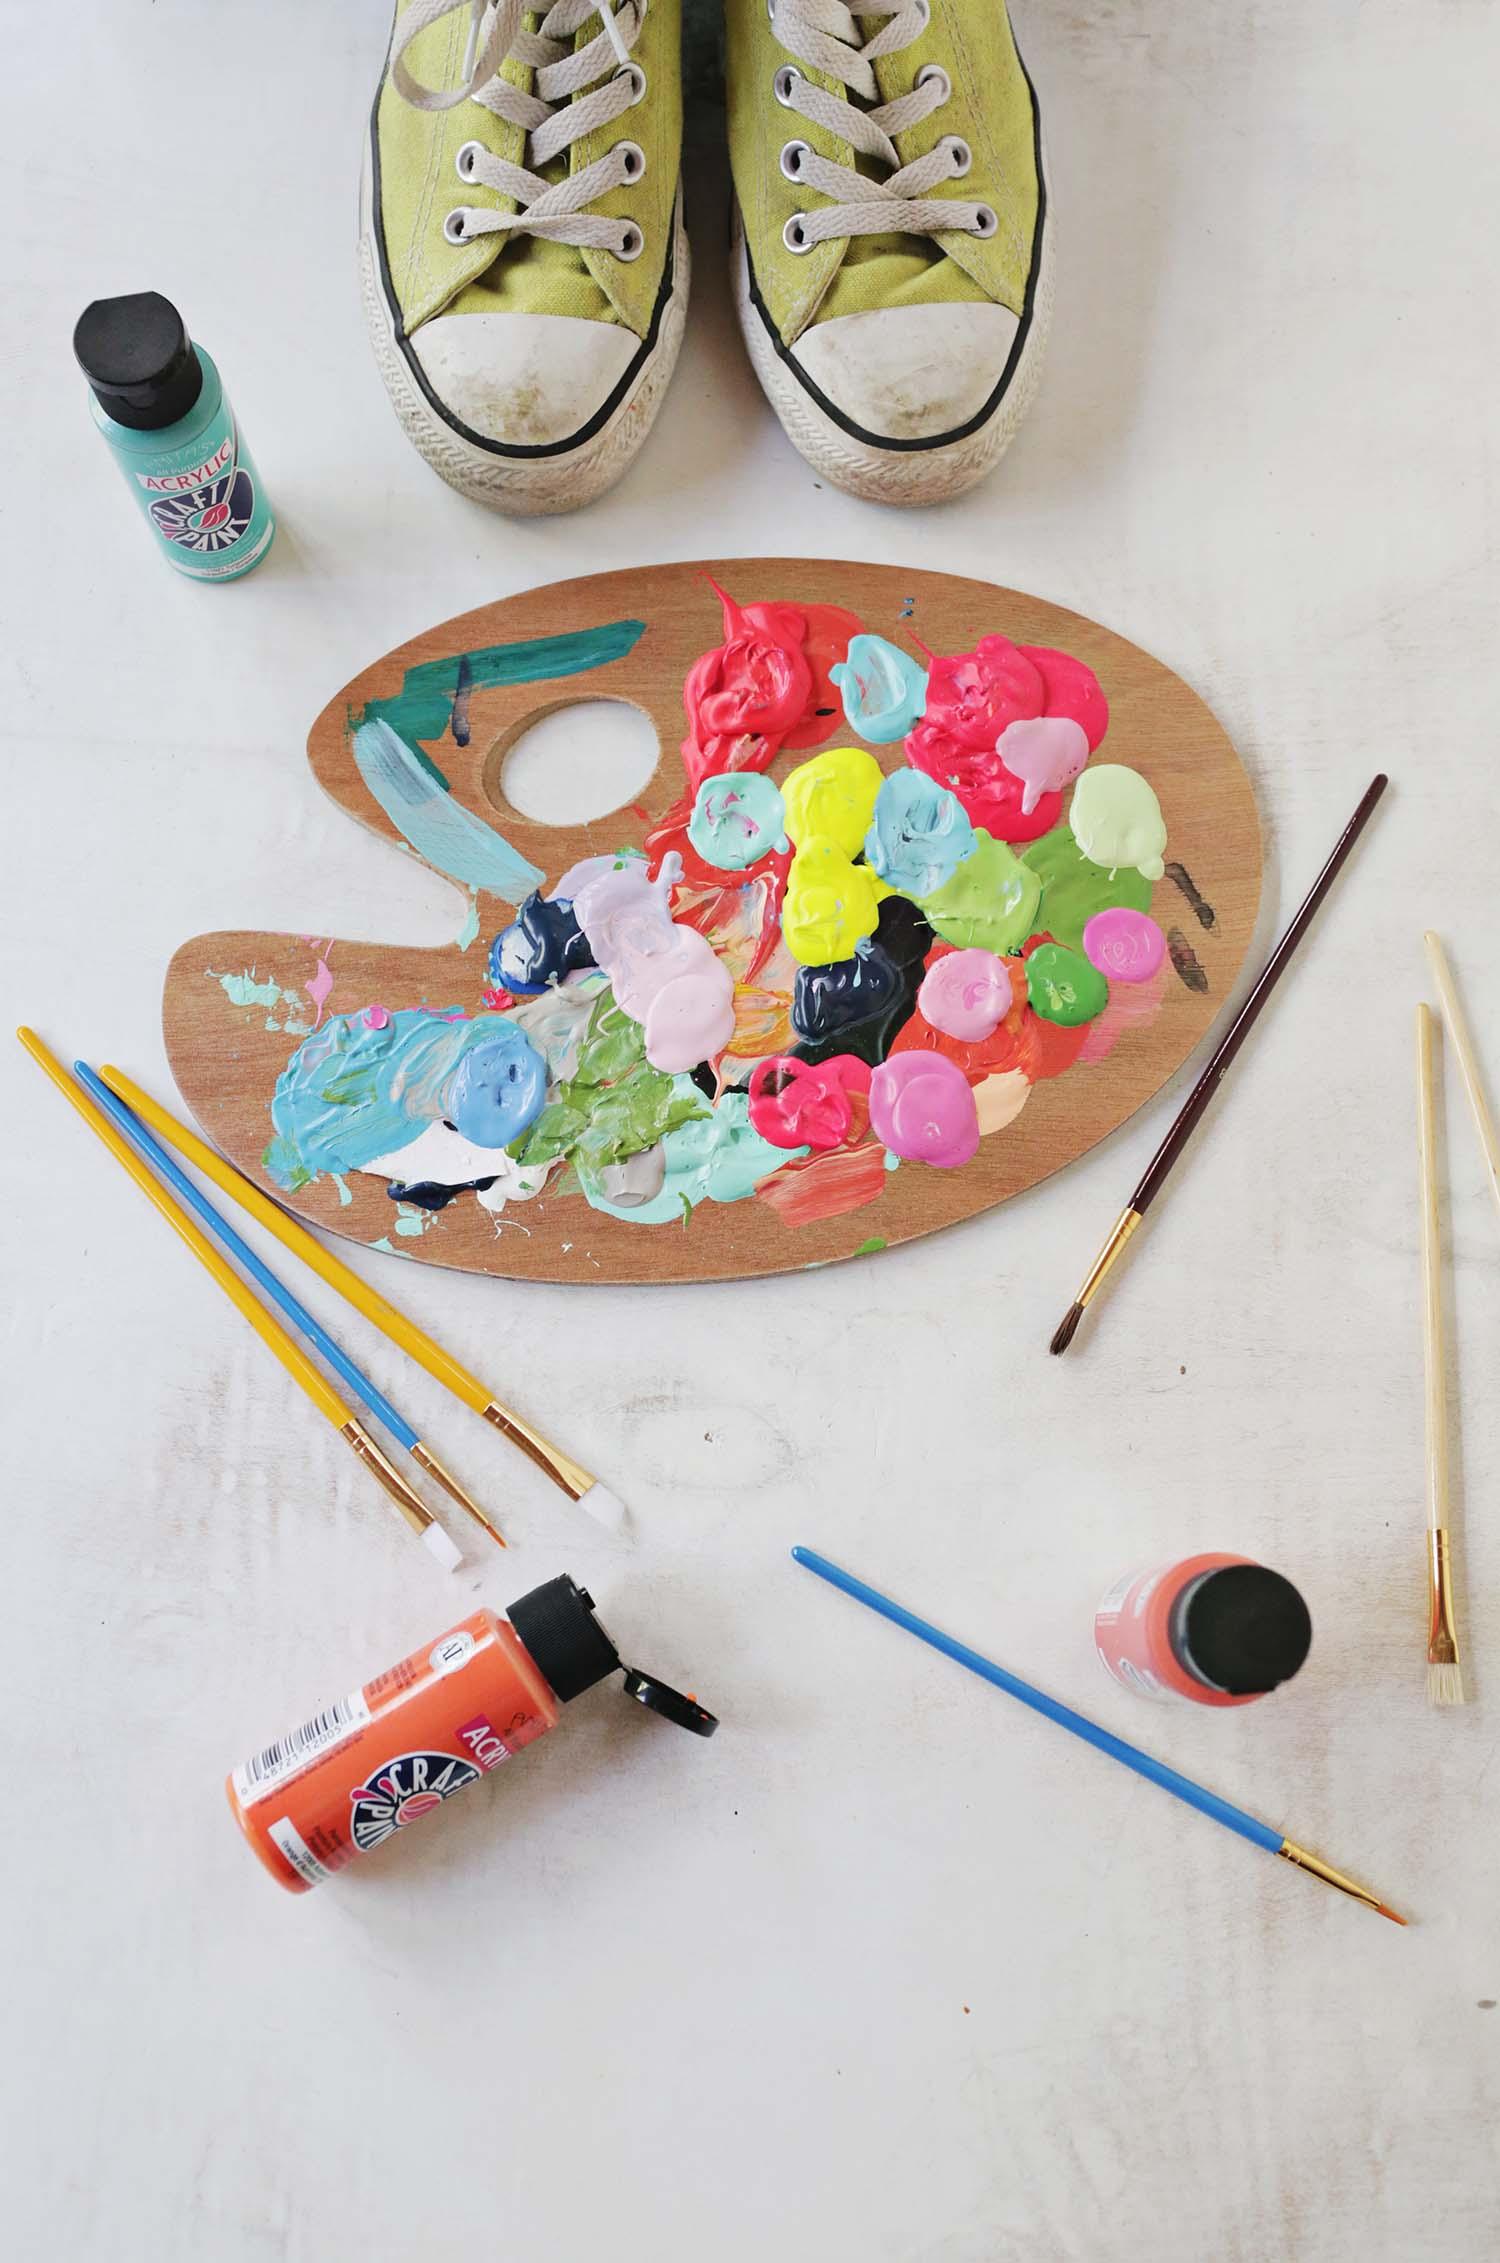 Creativity is a process